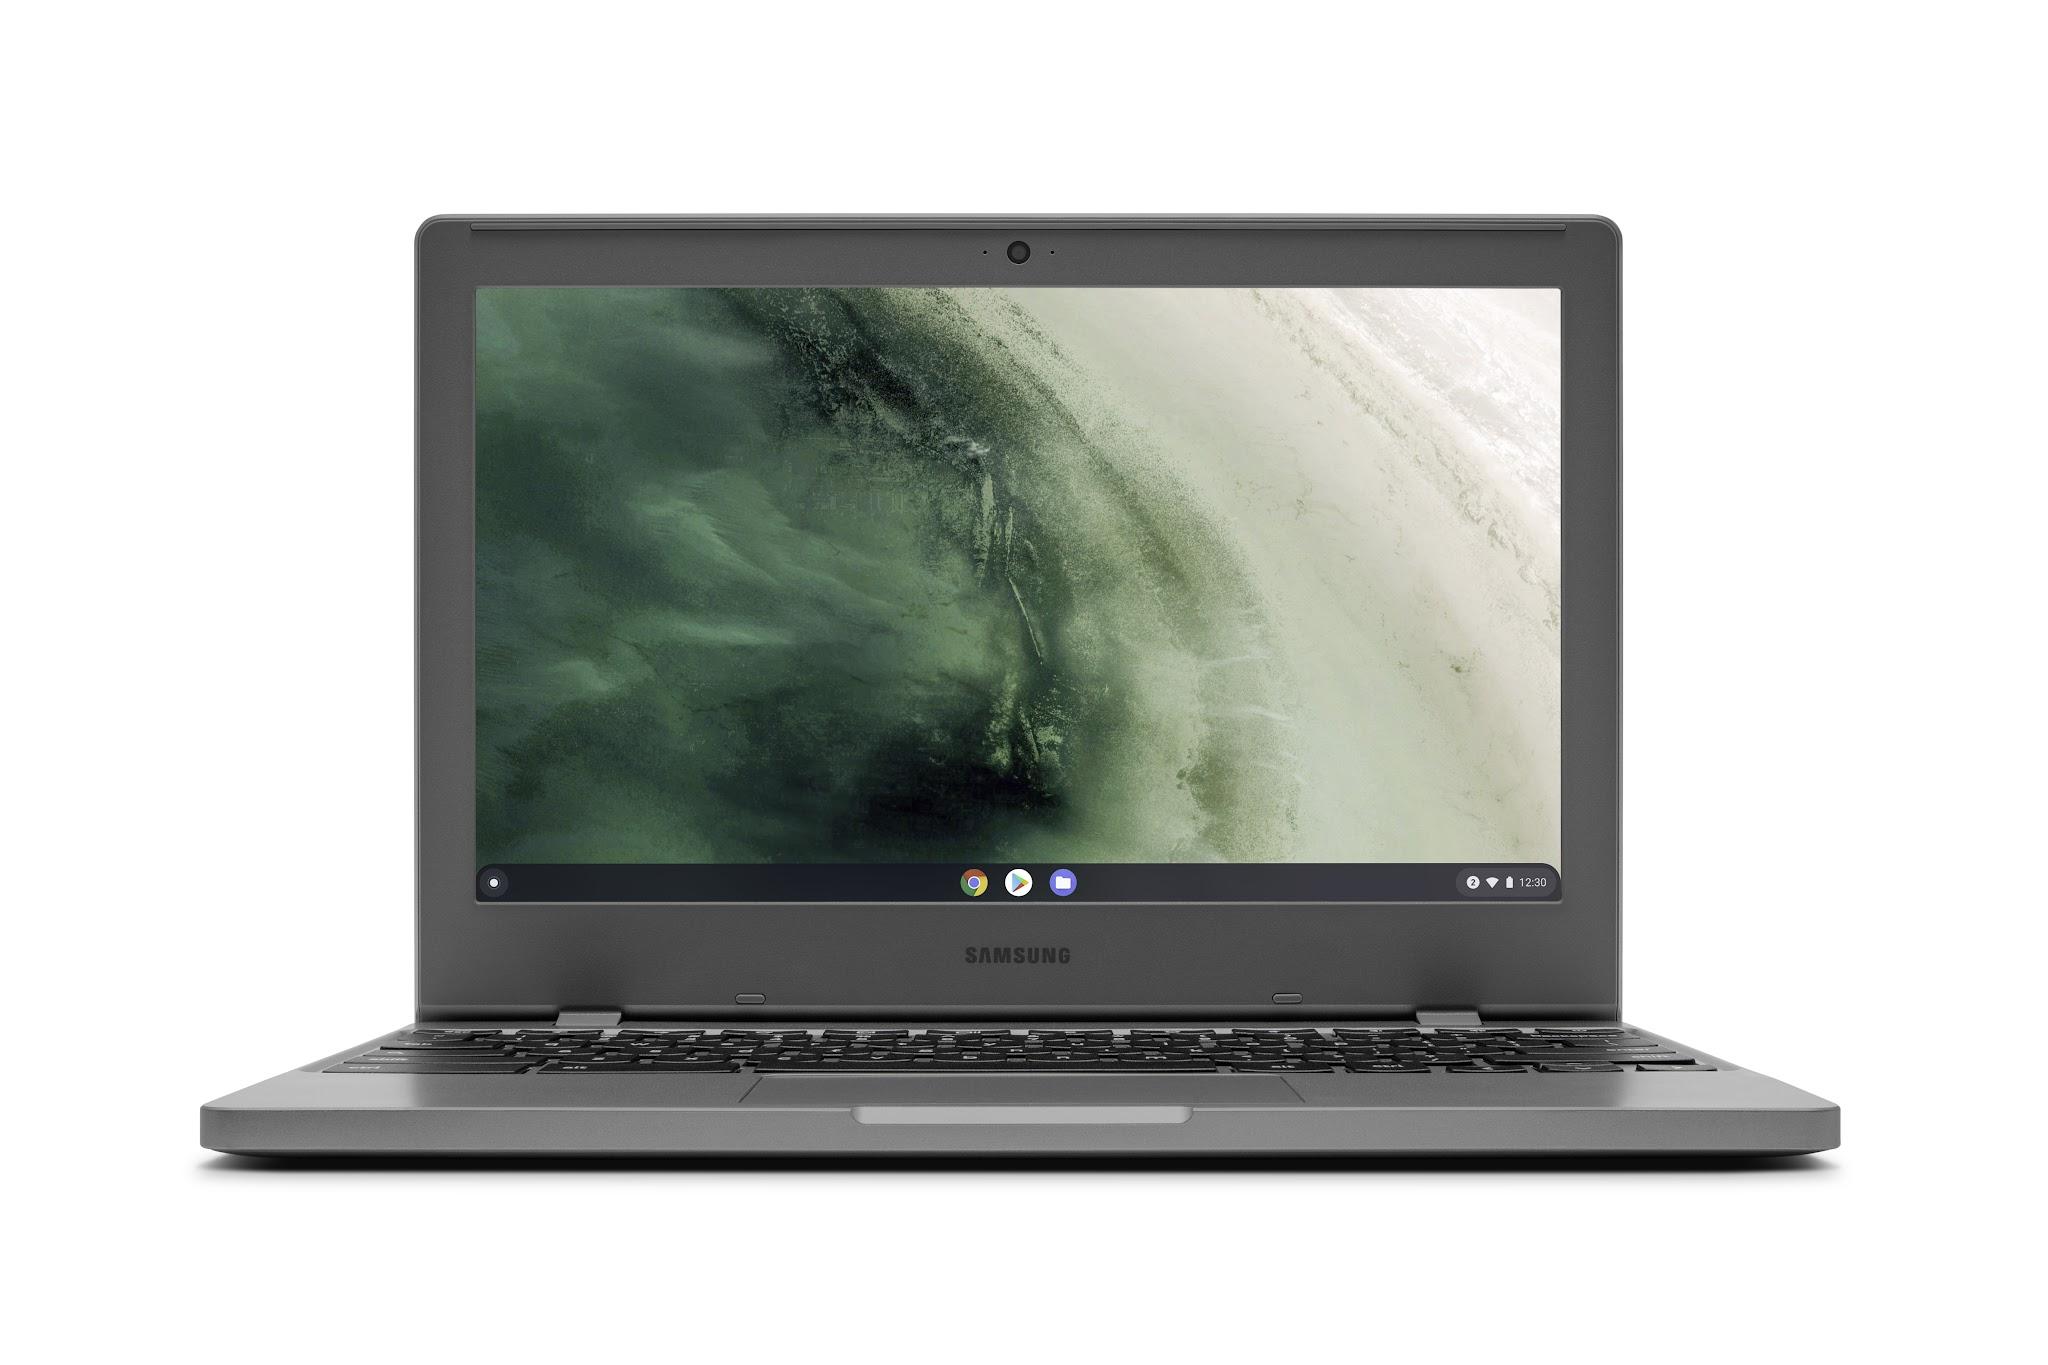 Samsung Chromebook 4 - photo 1